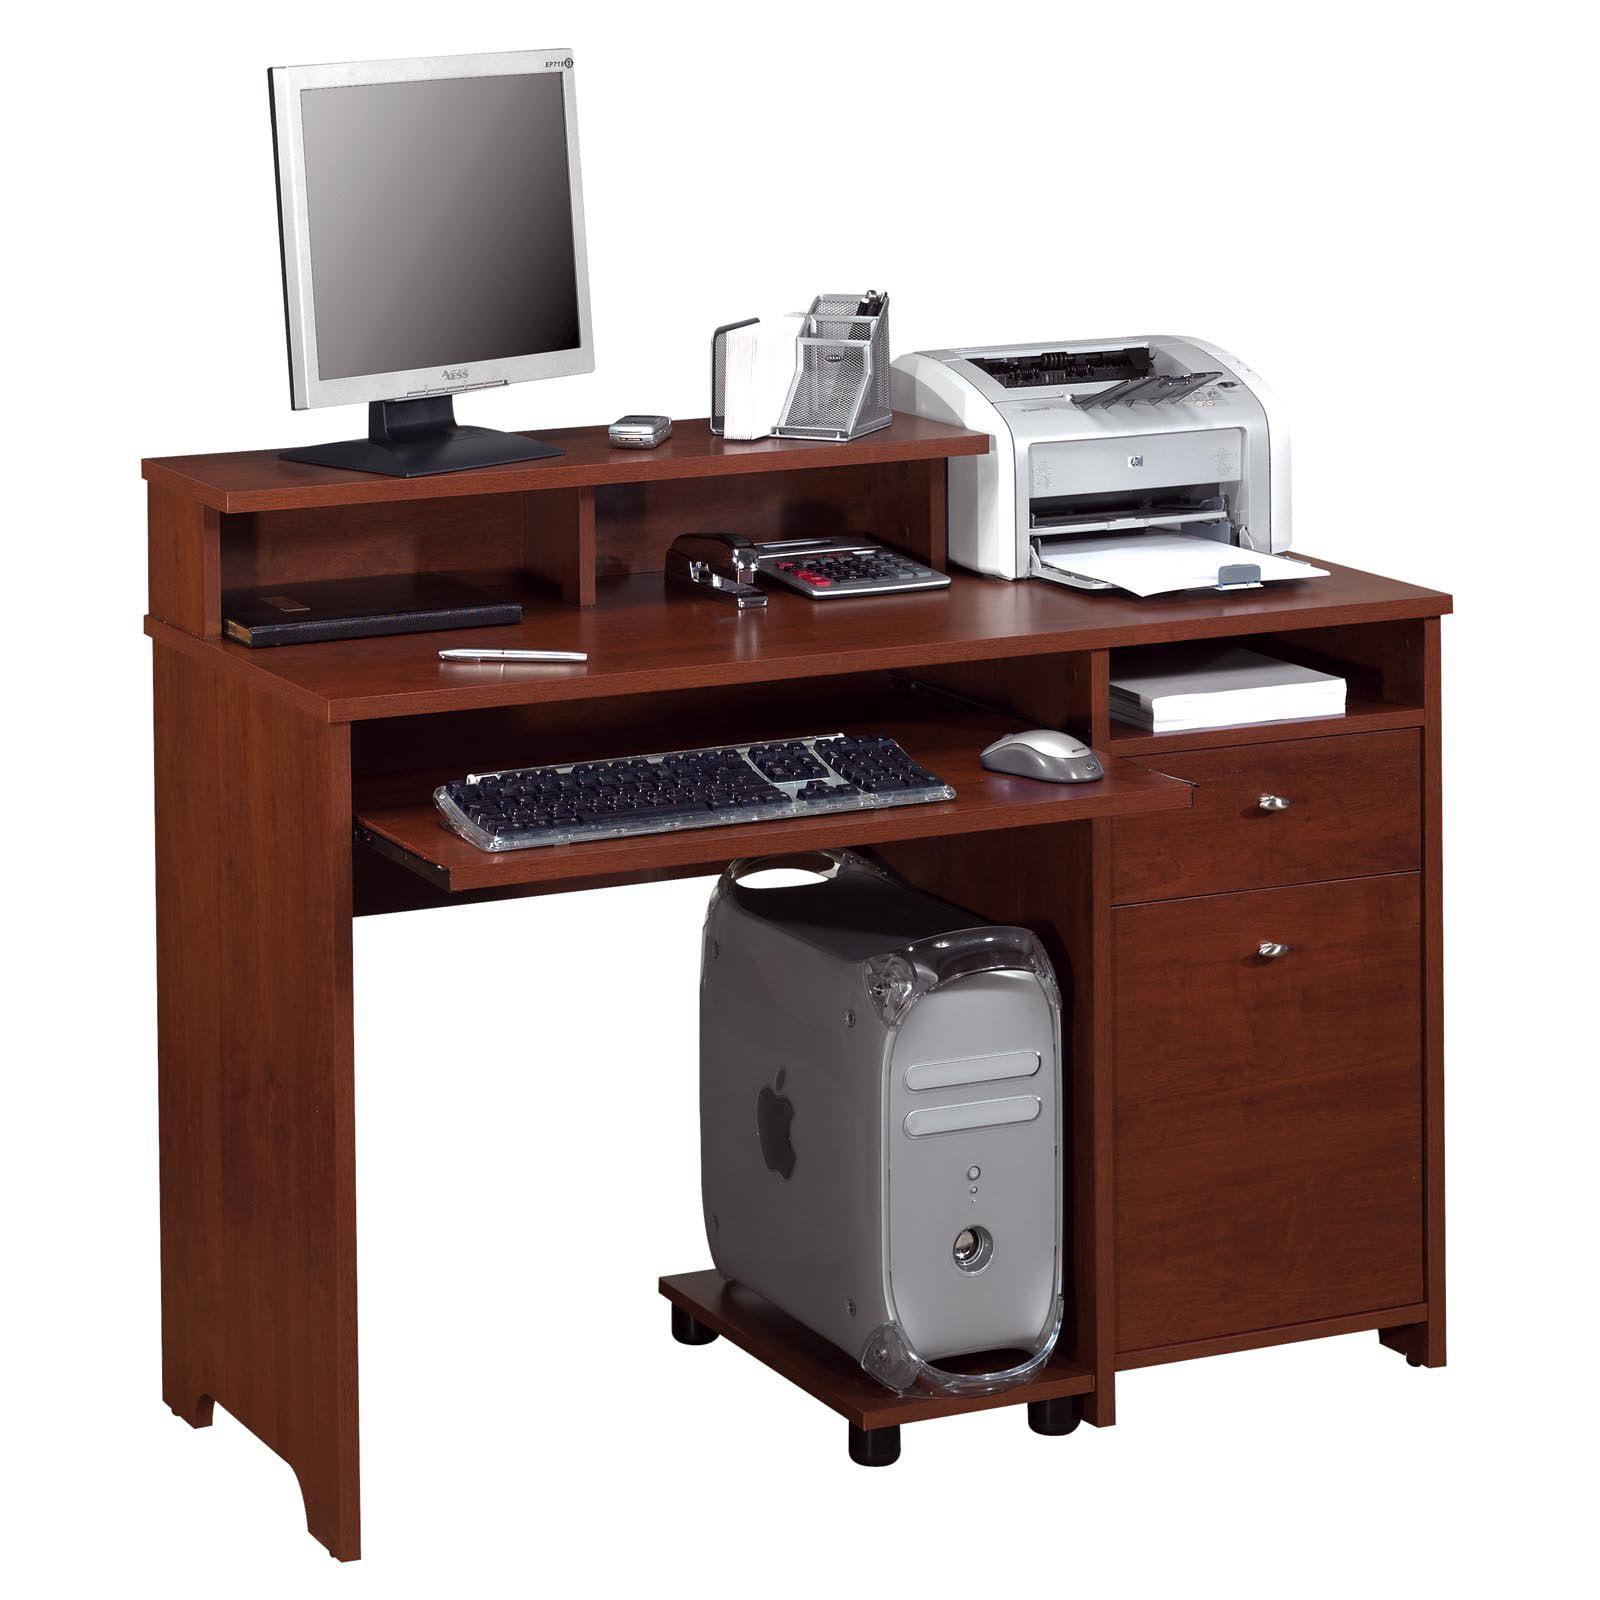 Bestar Garson Computer Desk - Walmart.com